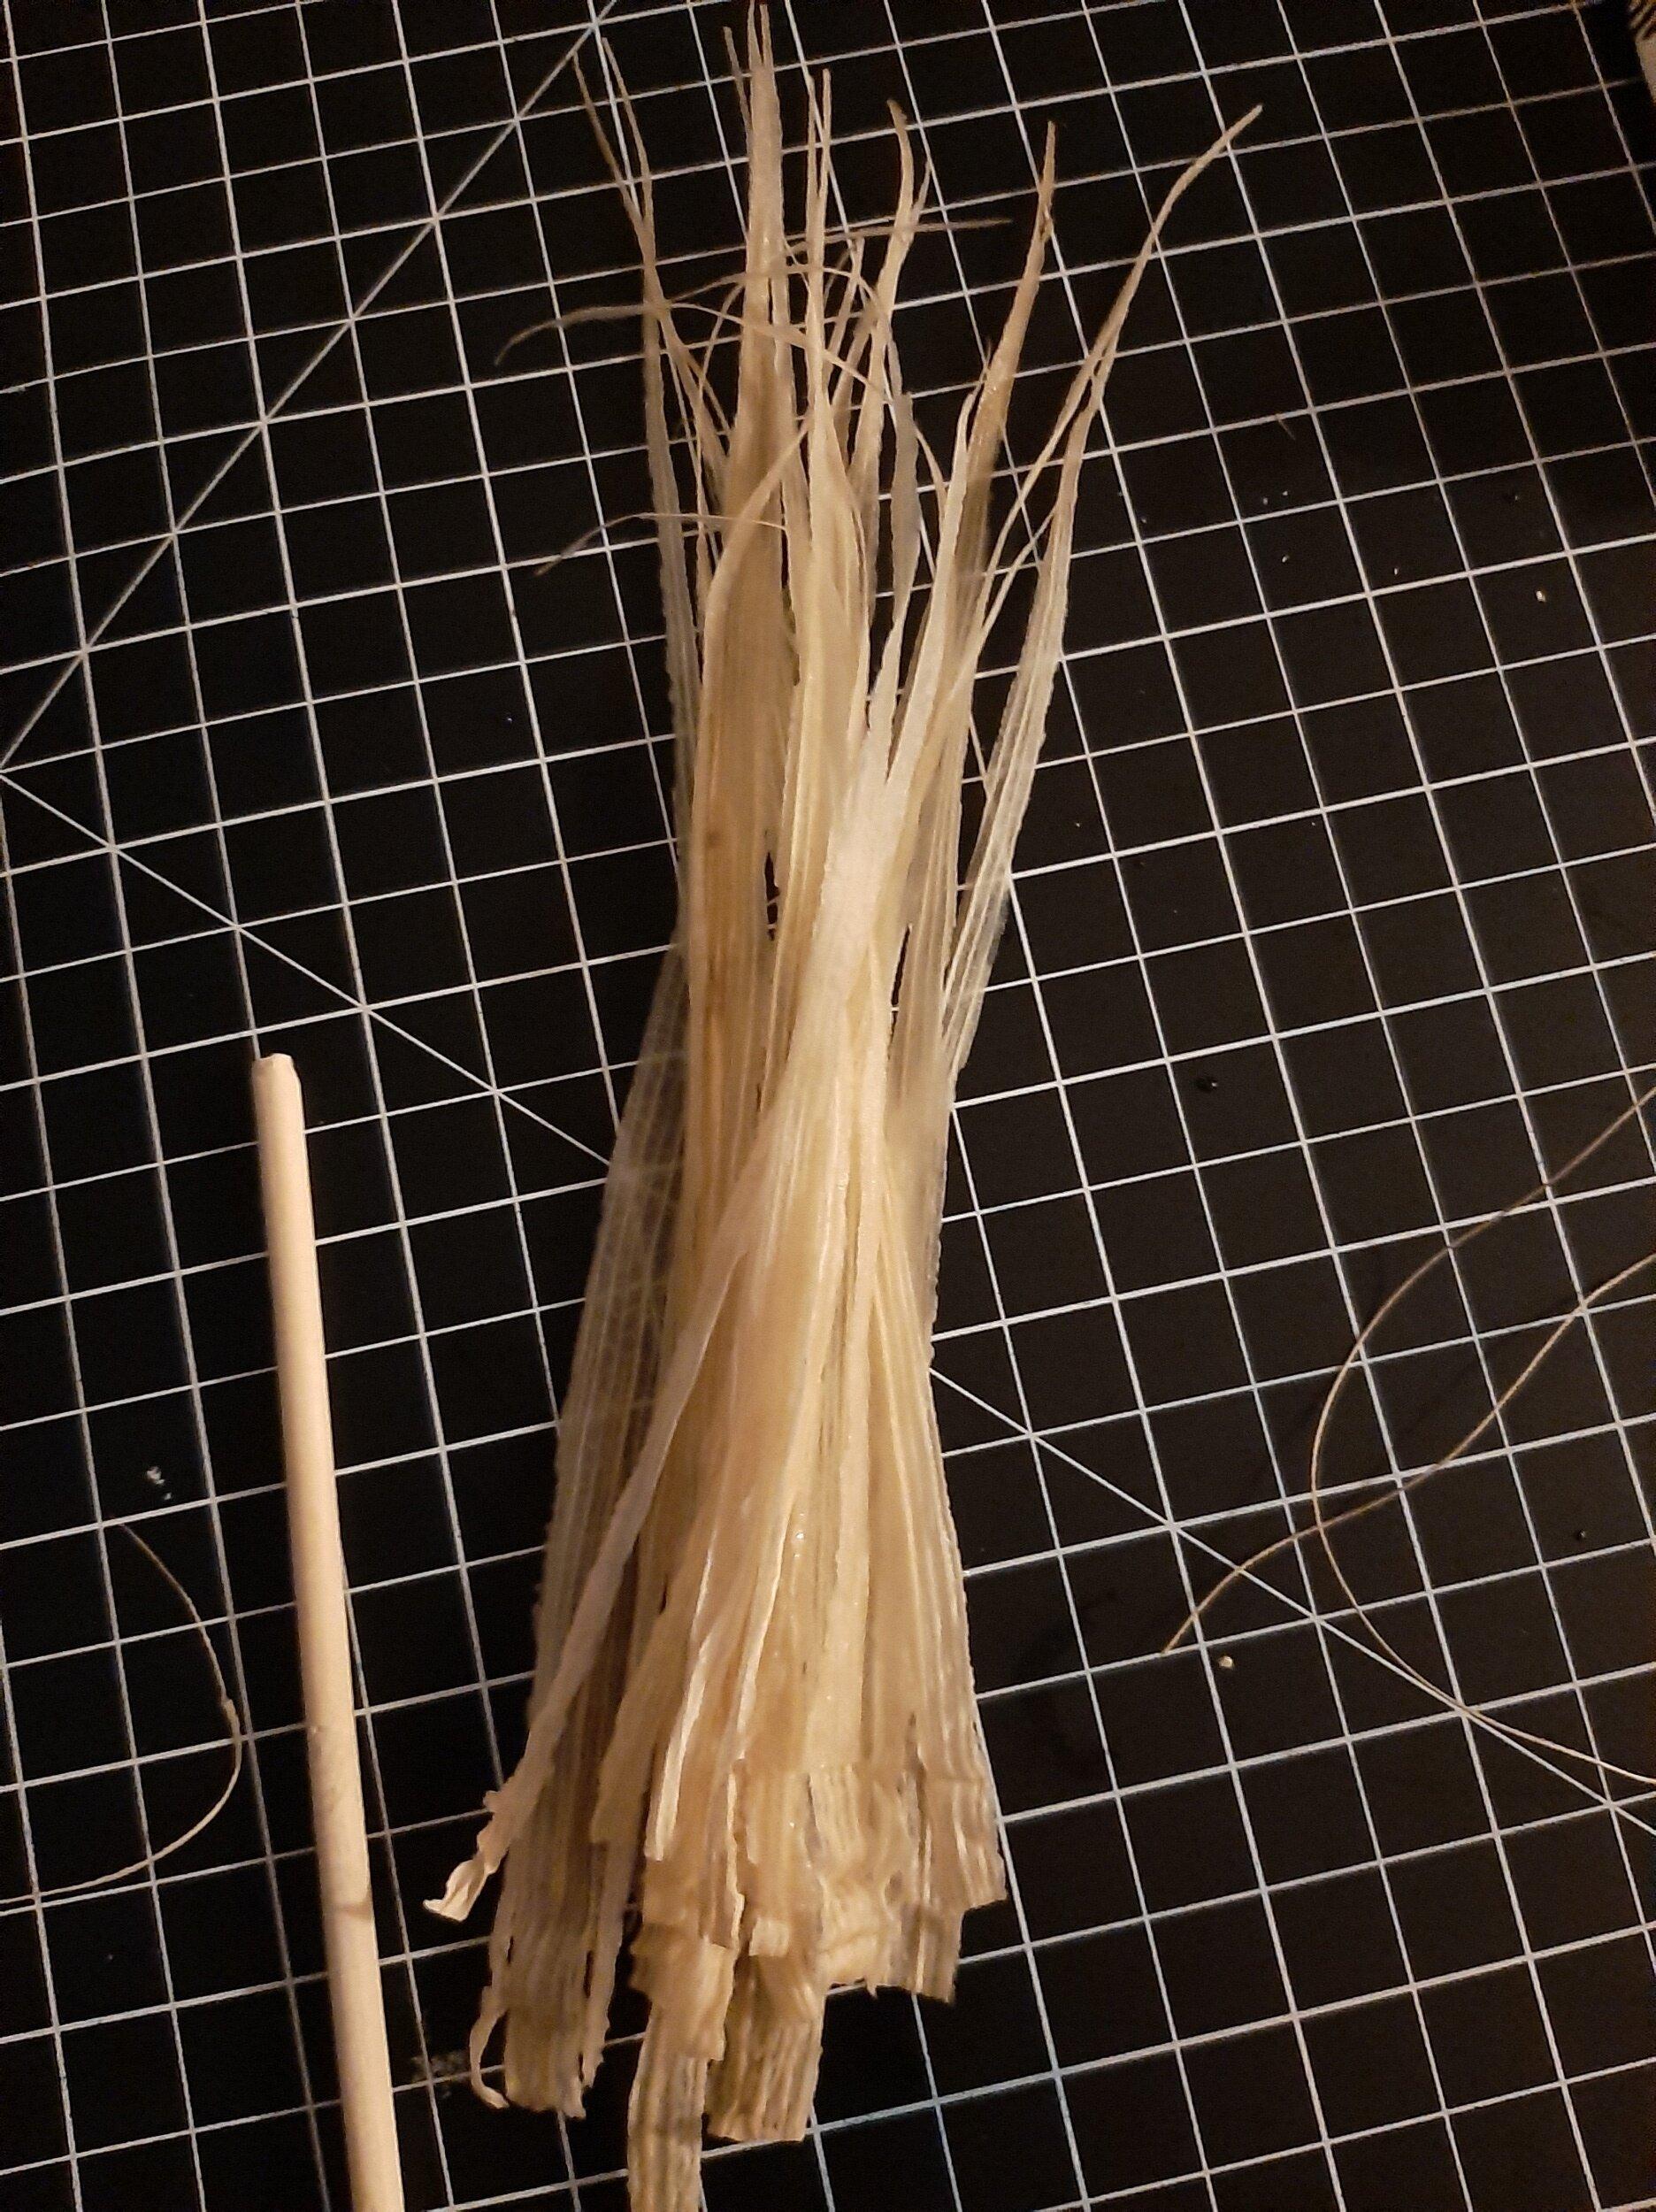 Thin strips of corn husk